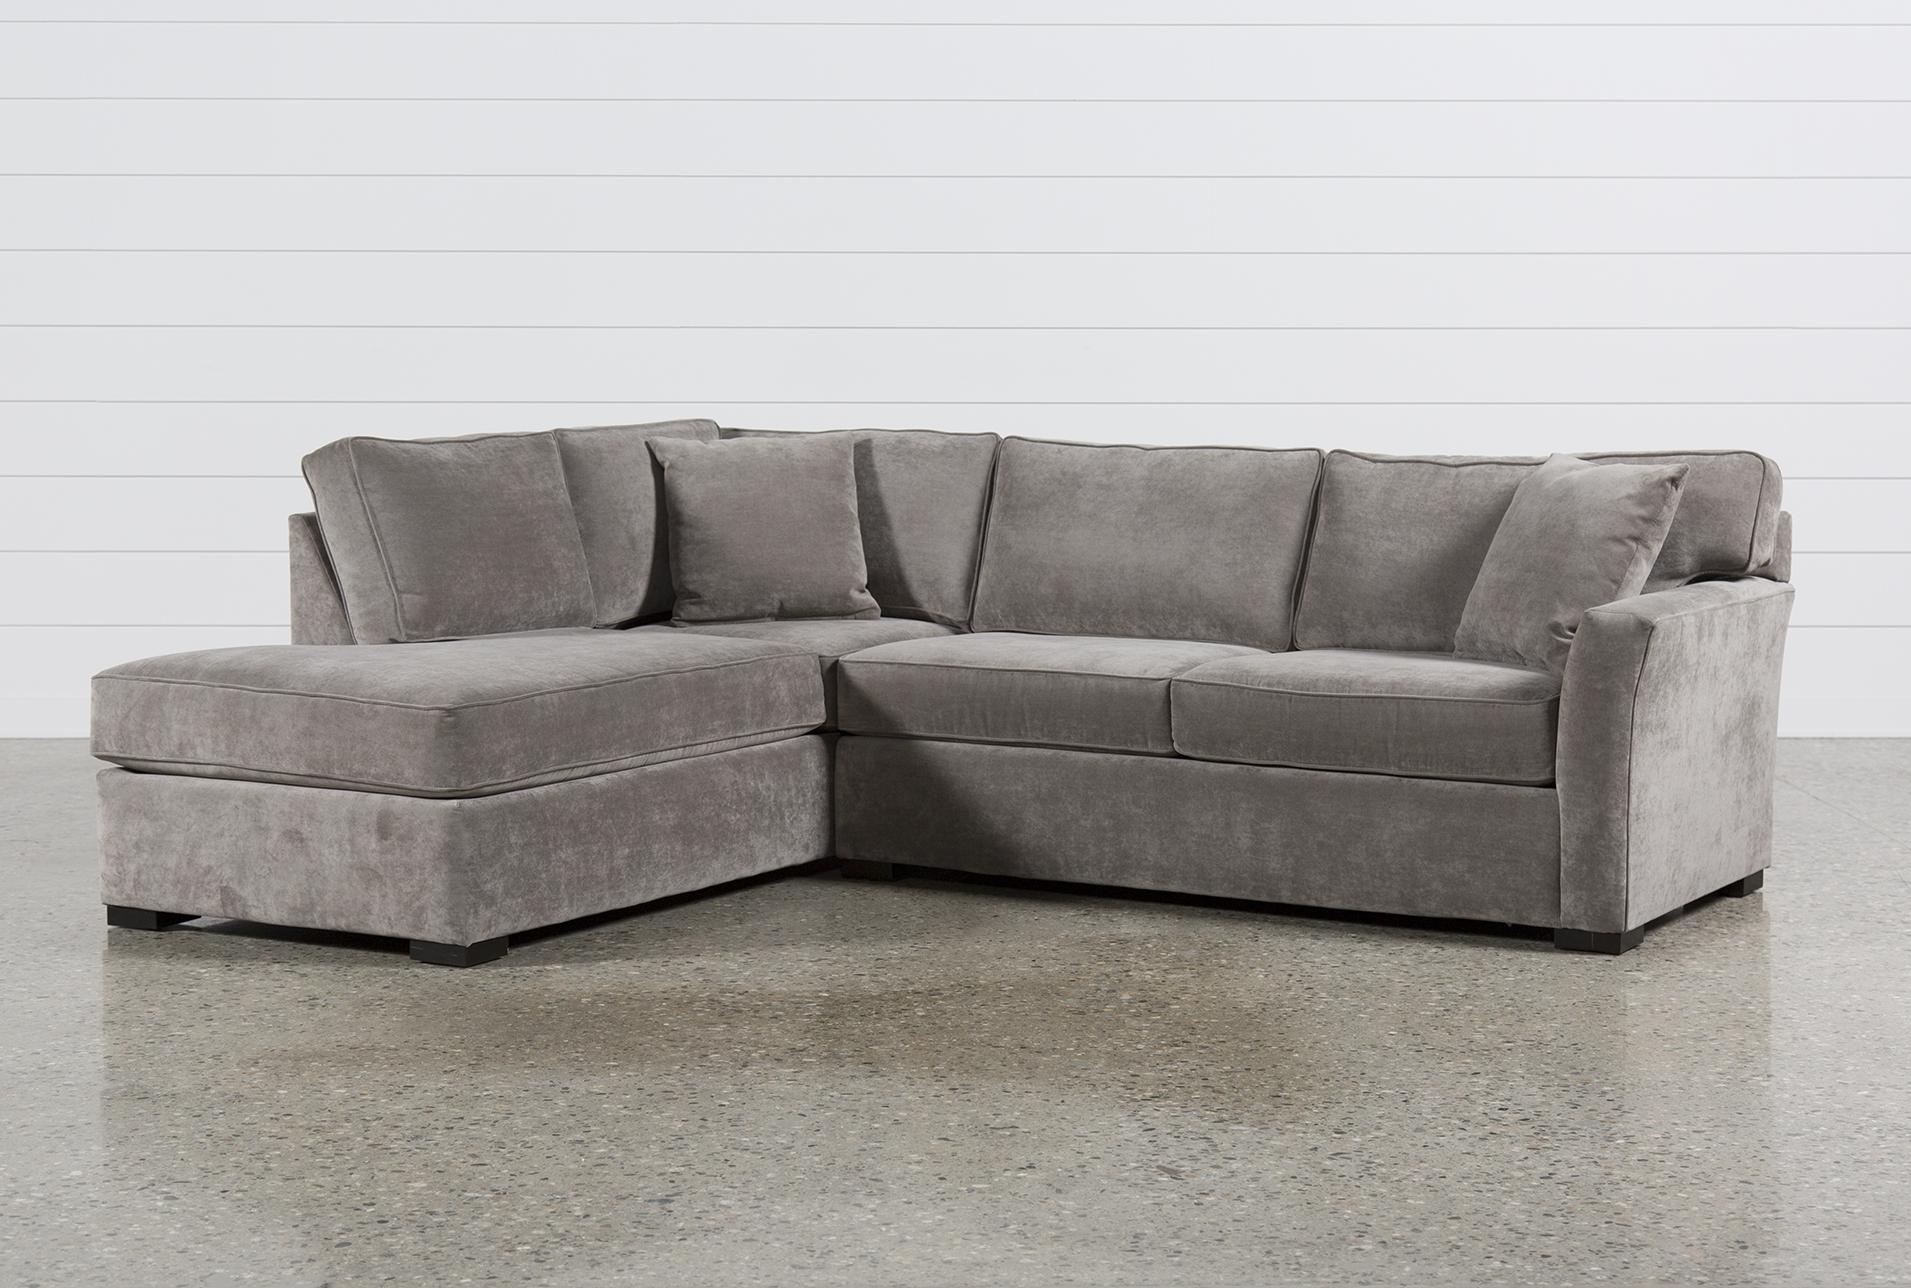 Aspen 2 Piece Sleeper Sectional WLaf Chaise